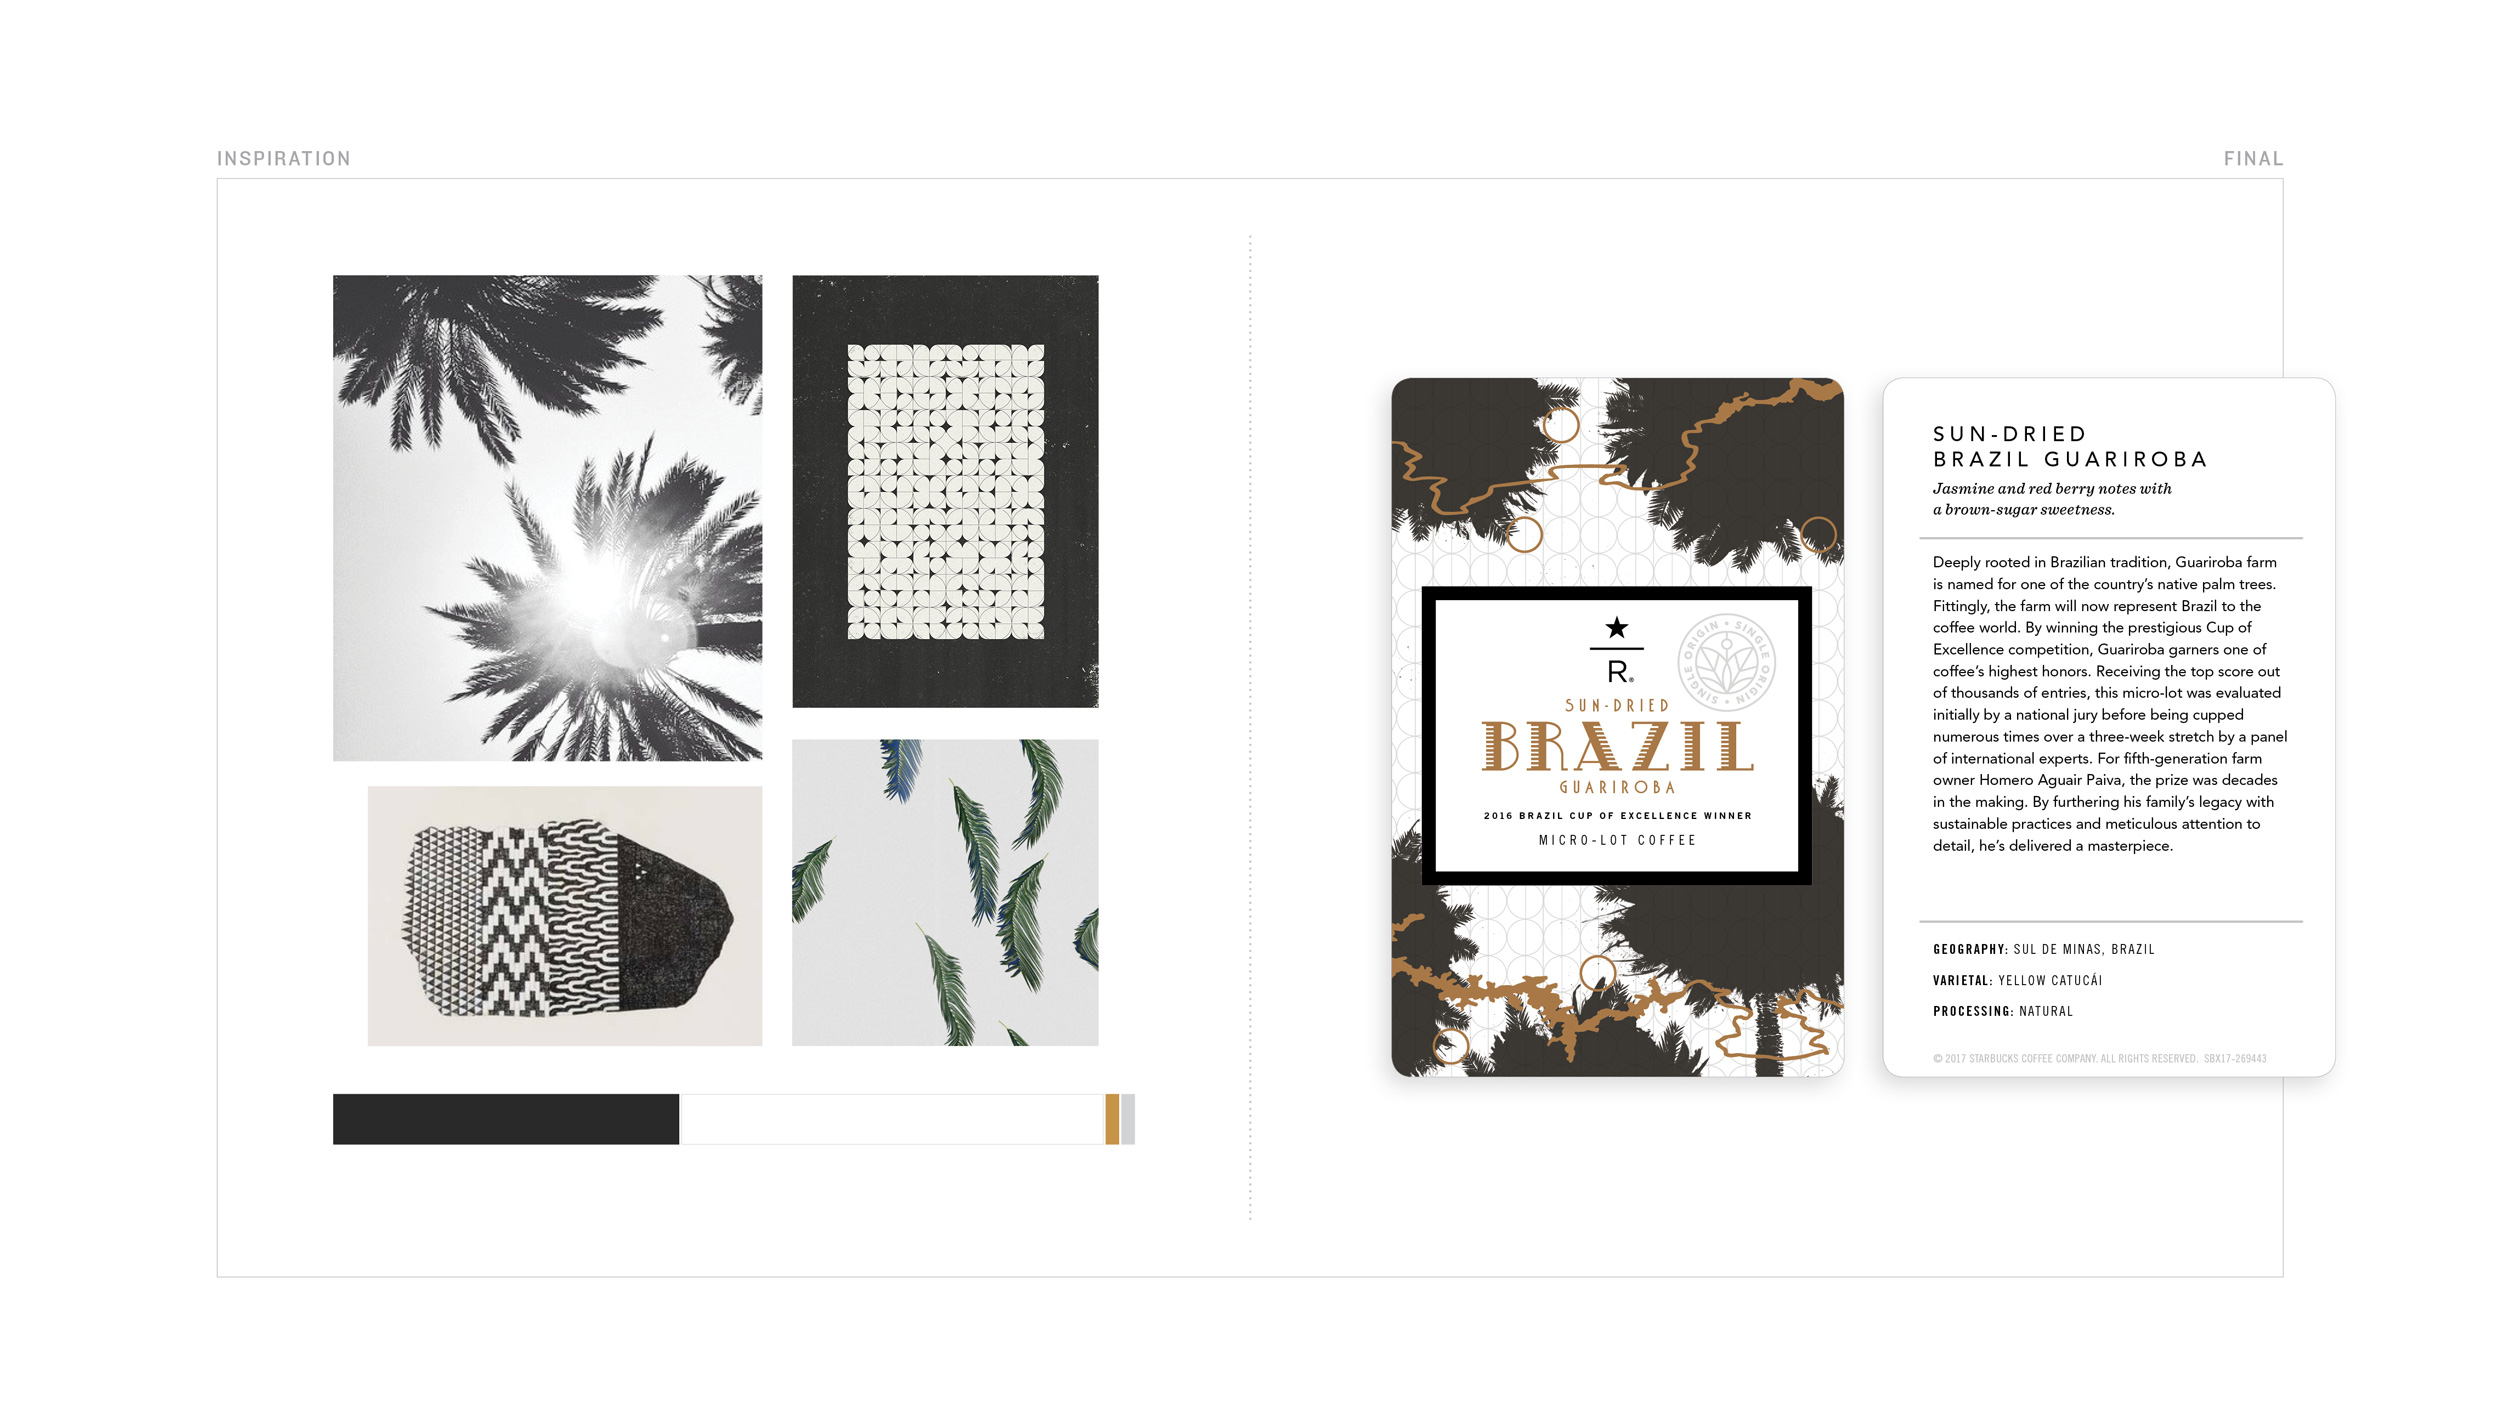 Brazil-Guariroba-Reserve-Cards-INSPIRATION.jpg